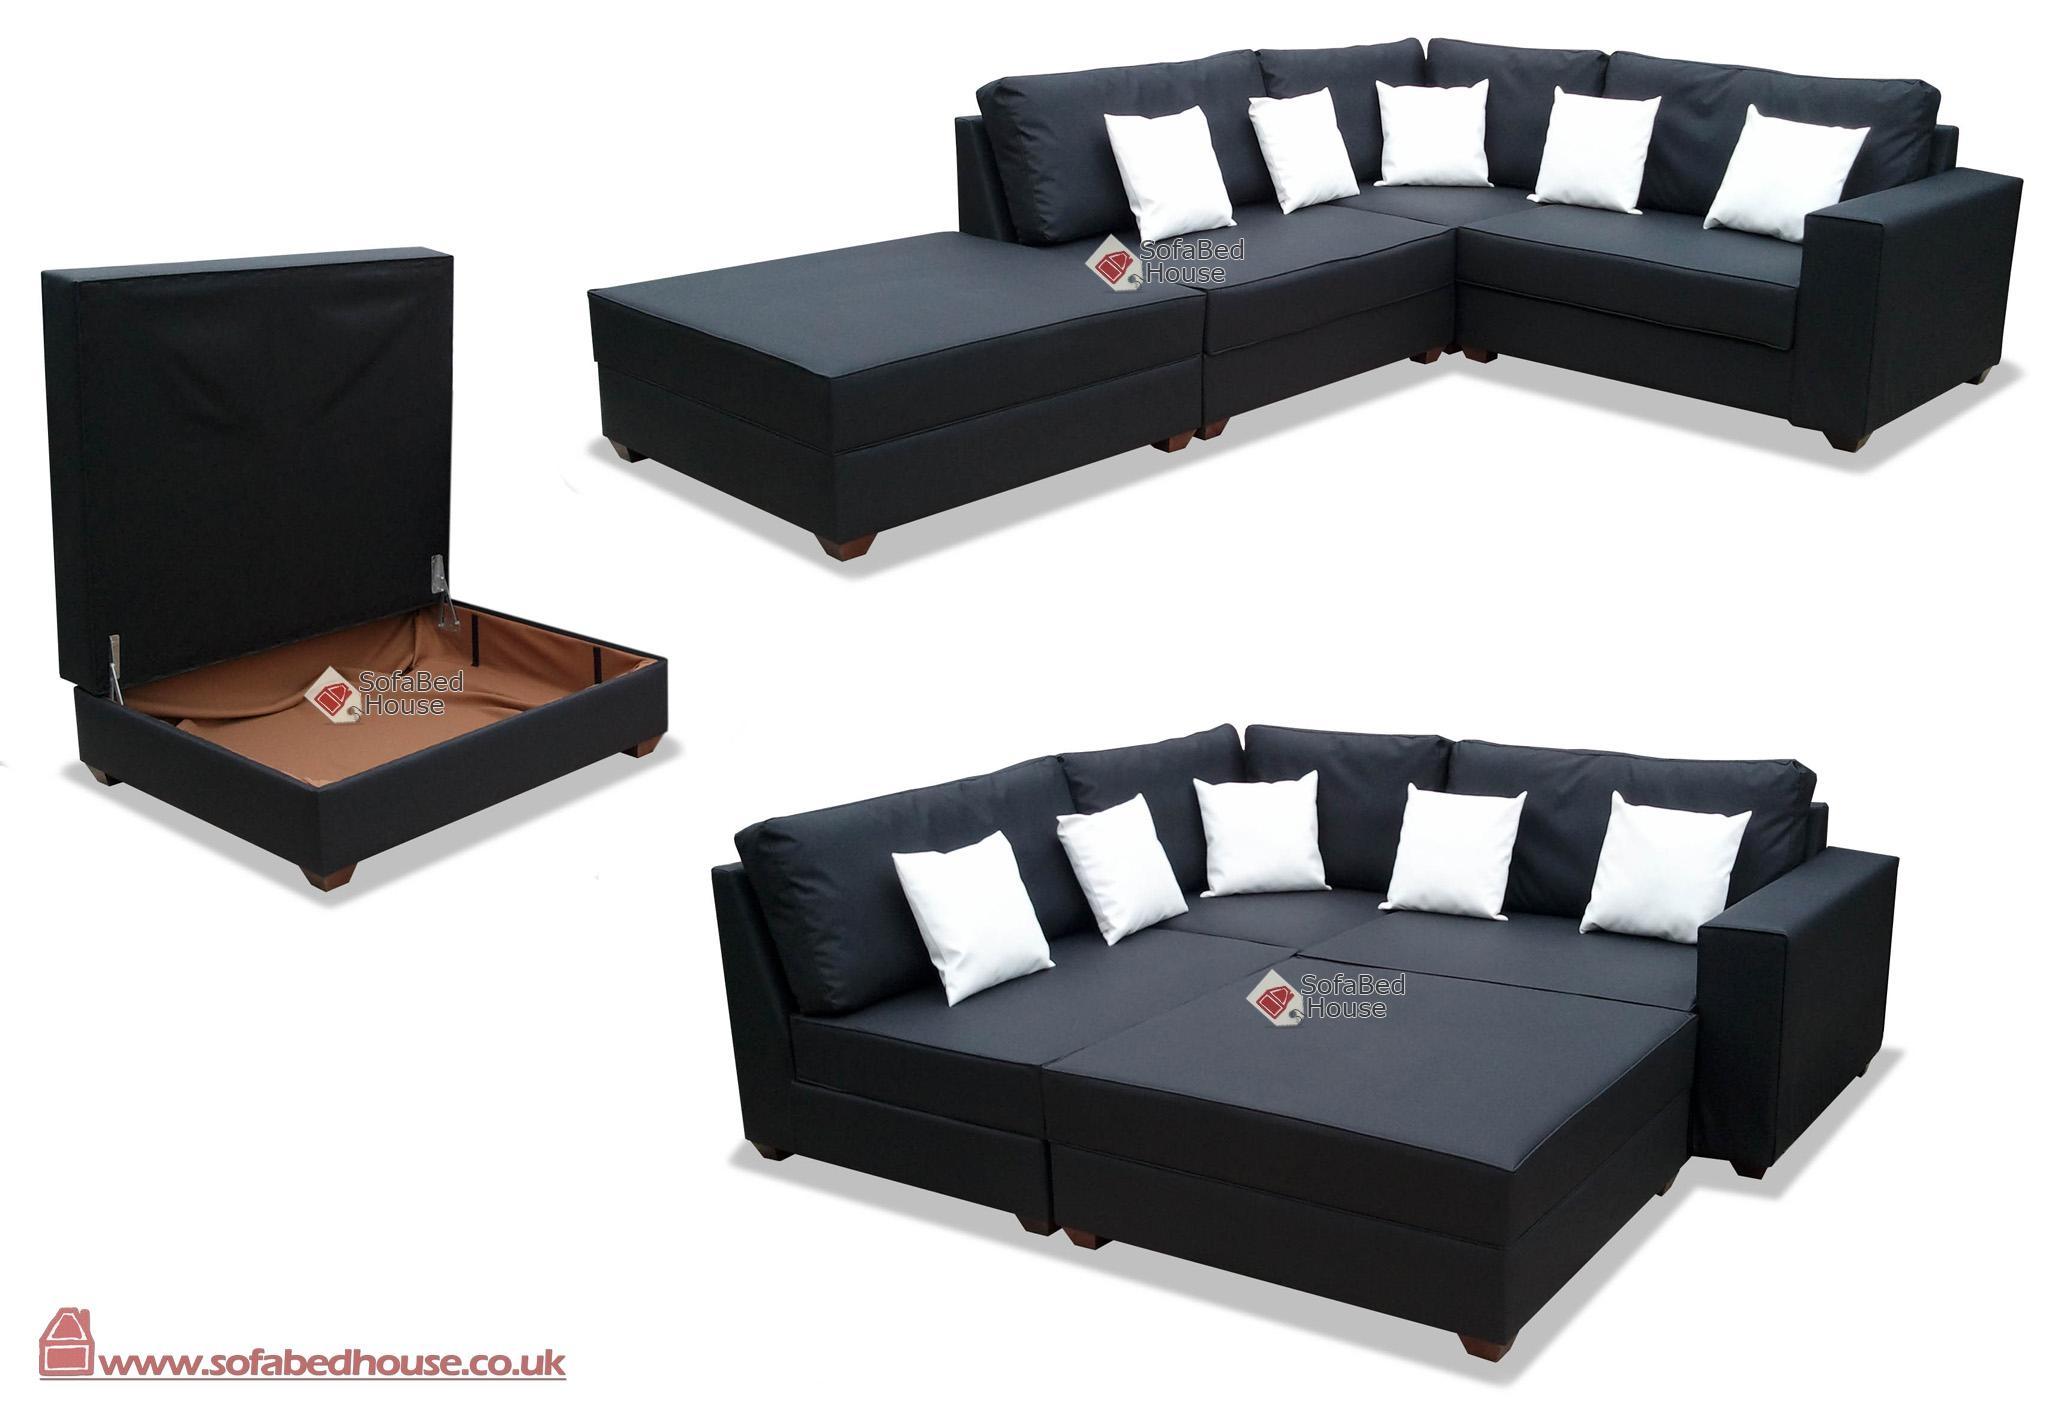 Cheap Corner Sofa Beds Uk | Crepeloversca Pertaining To Cheap Corner Sofa Beds (View 2 of 20)